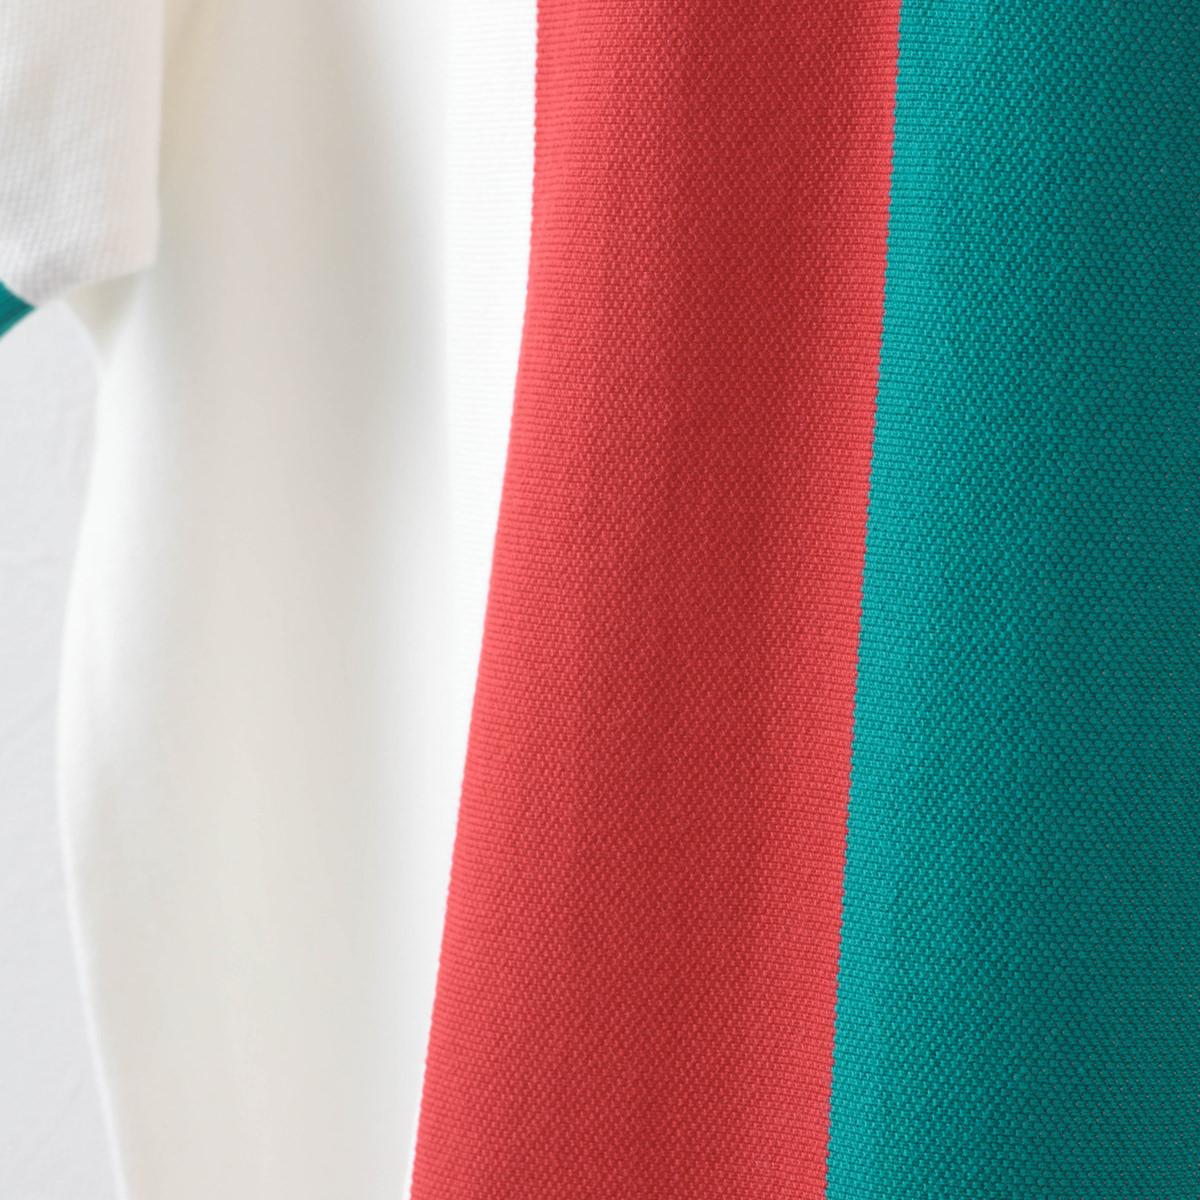 Fred Perry フレッドペリー メンズ ファネルネック ポロシャツ 半袖 コットン ジップ ハイネック ストライプ ホワイト プレッピー 正規販売店